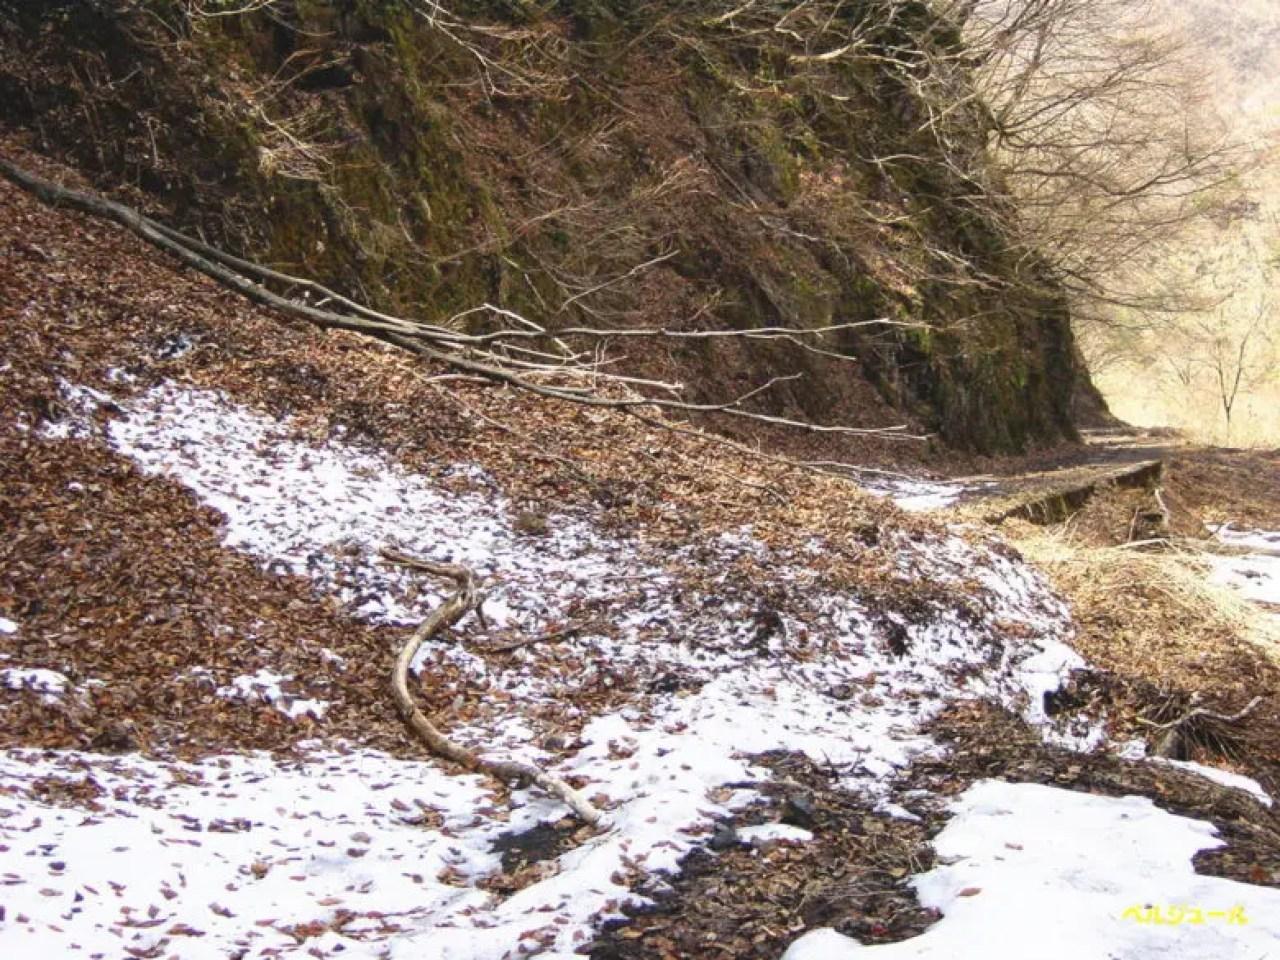 tokuyama00004 - 揖斐川上流・旧徳山村での岩魚釣り